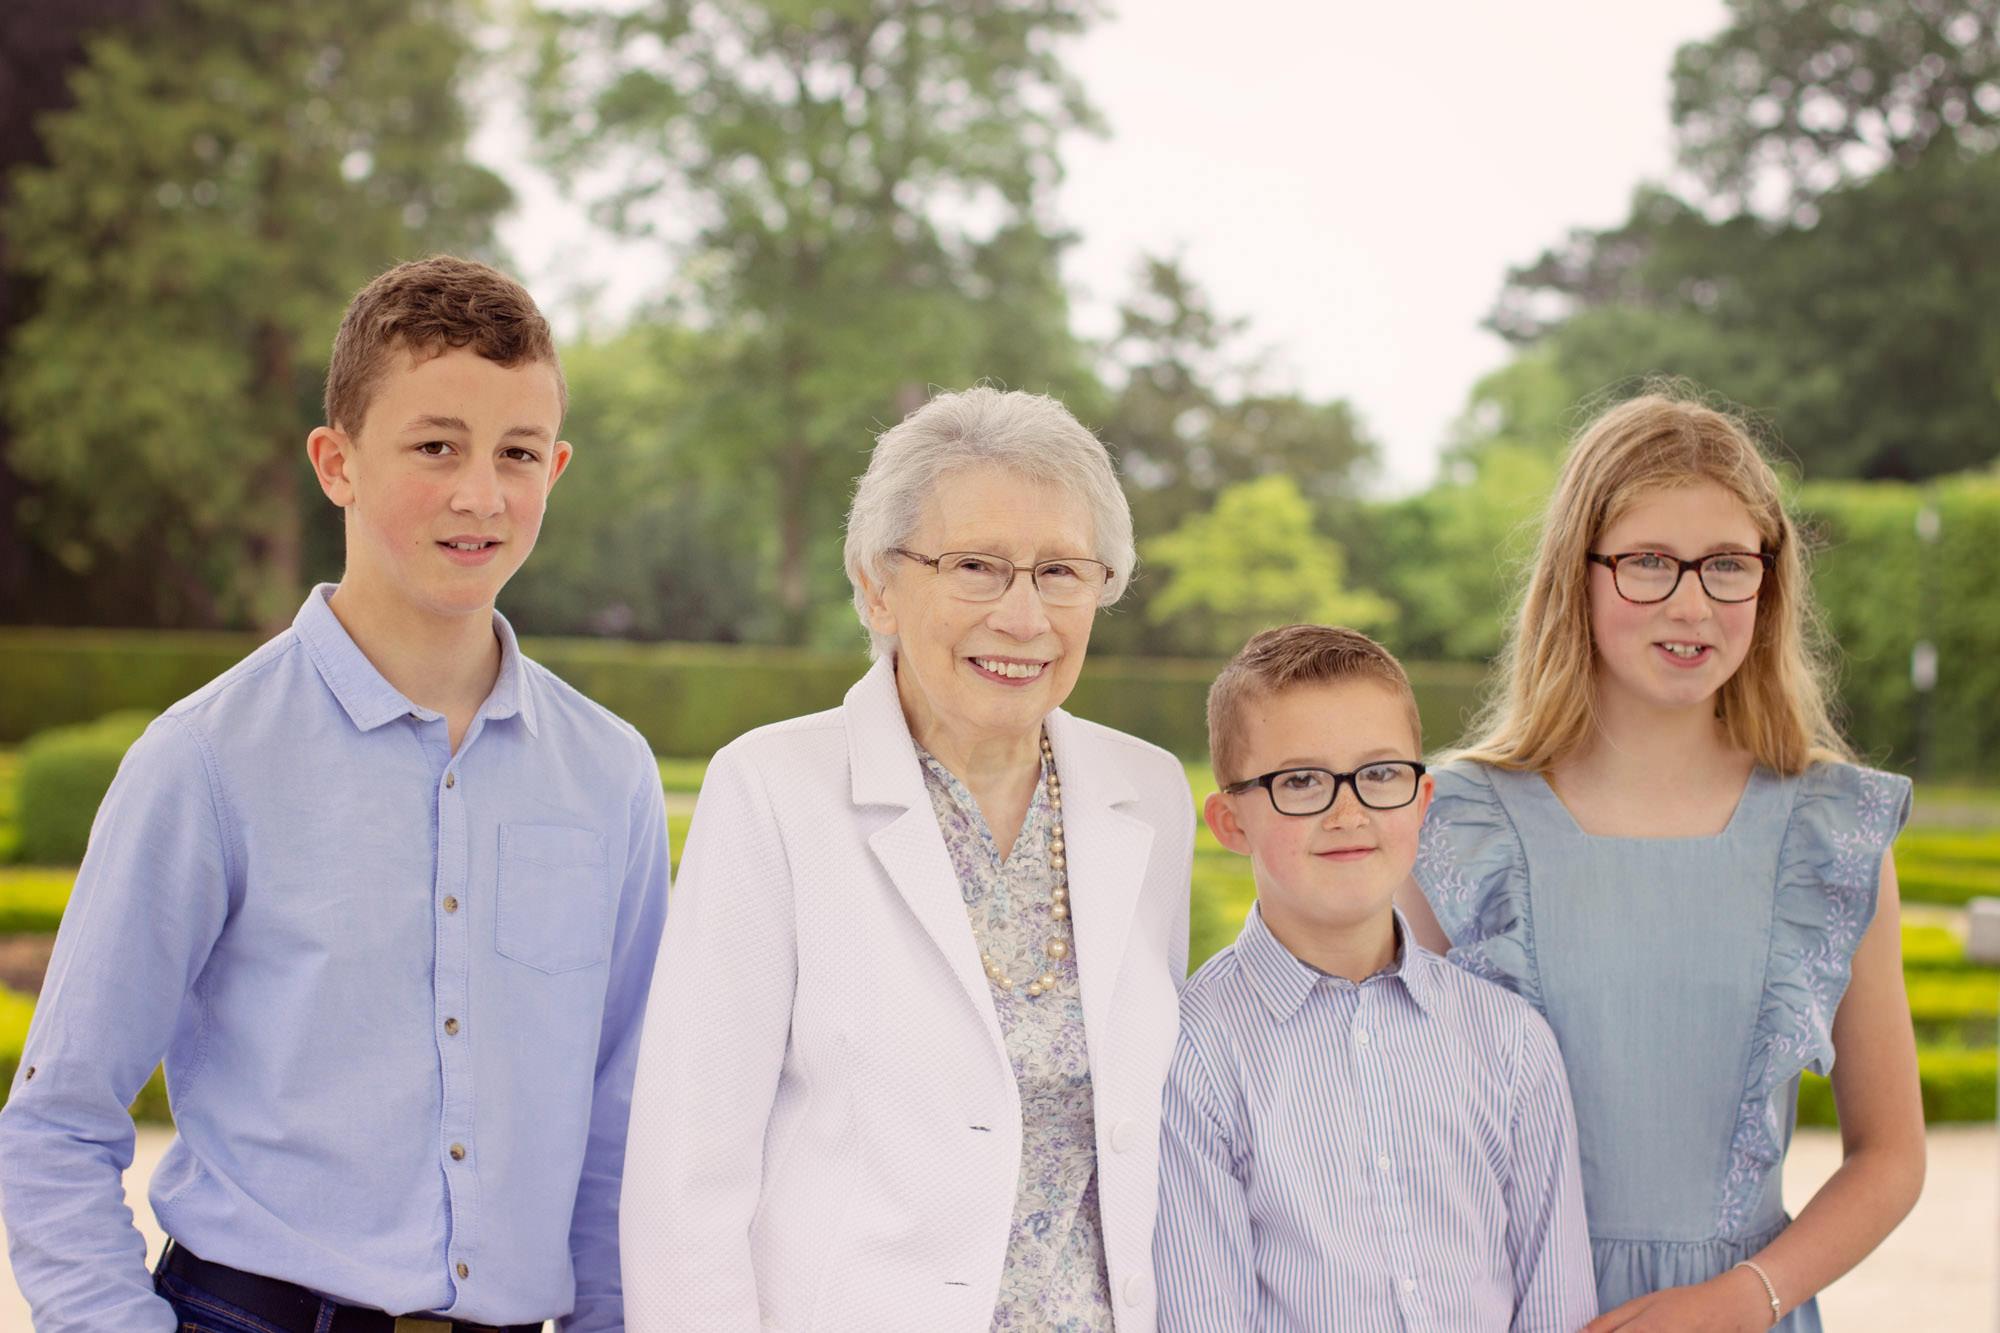 family photoshoot vouchers NORTHERN IRELAND